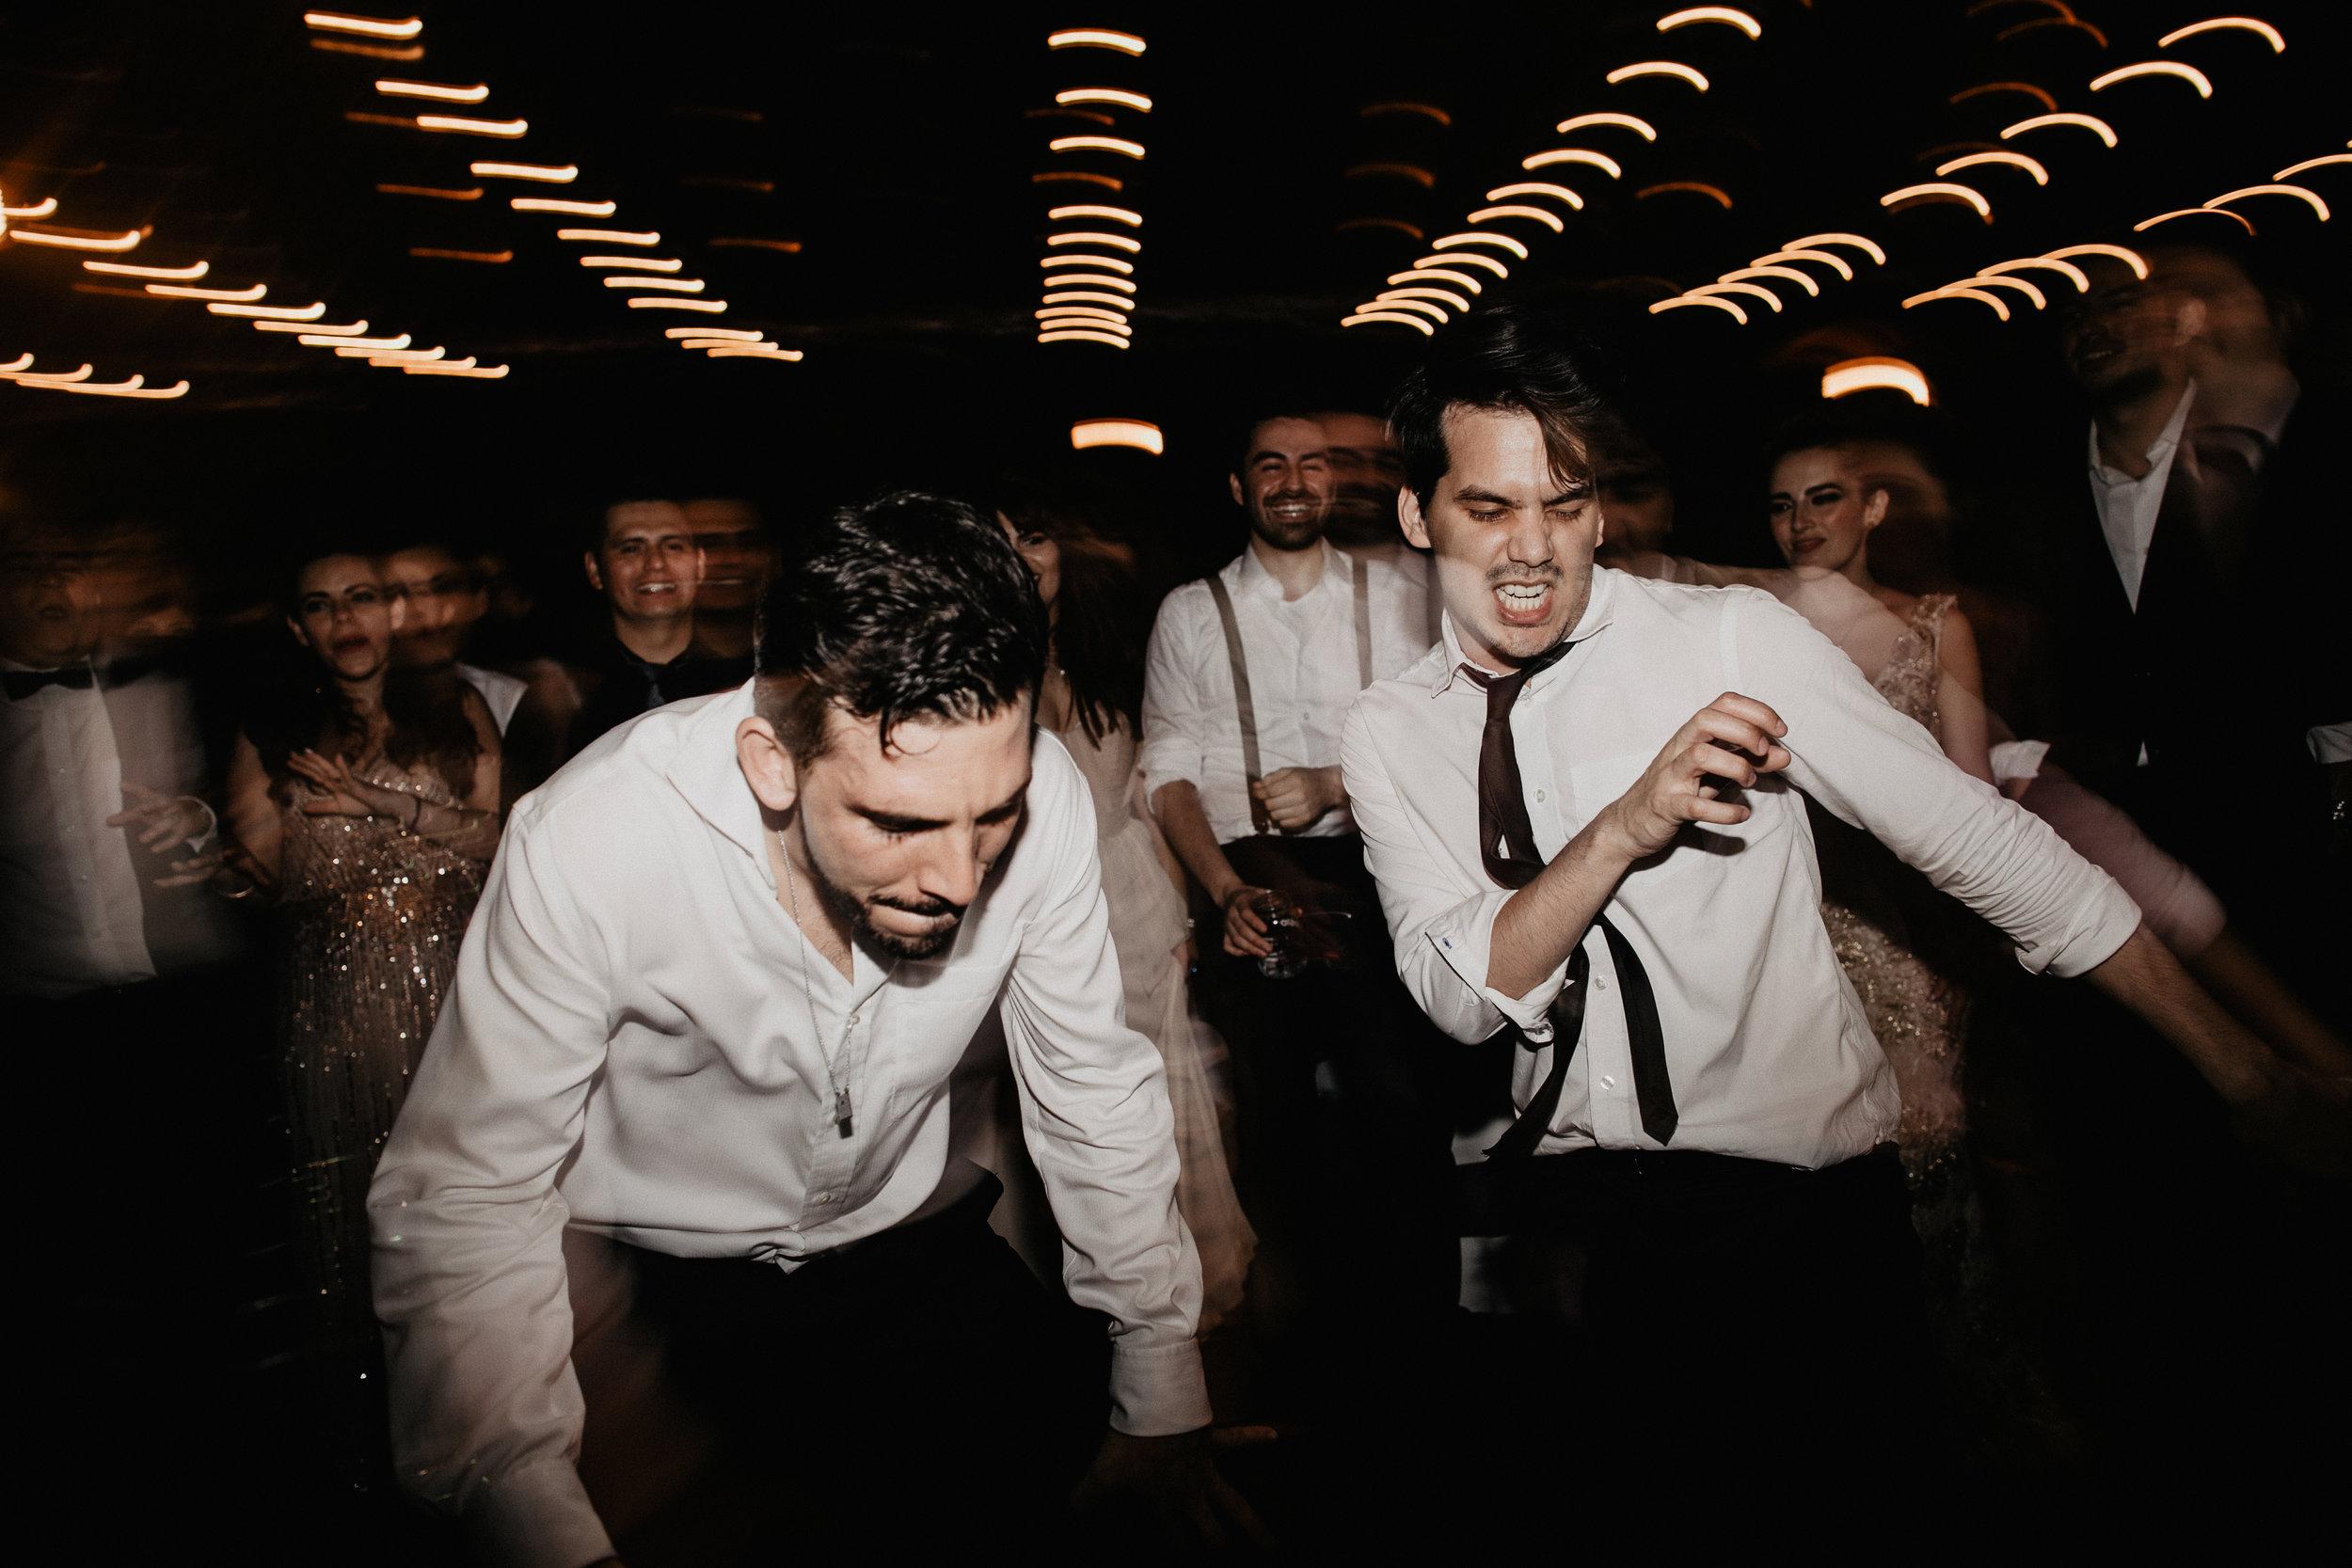 Alfonso_flores_destination_wedding_photography_vanesa_carlos-1293.JPG